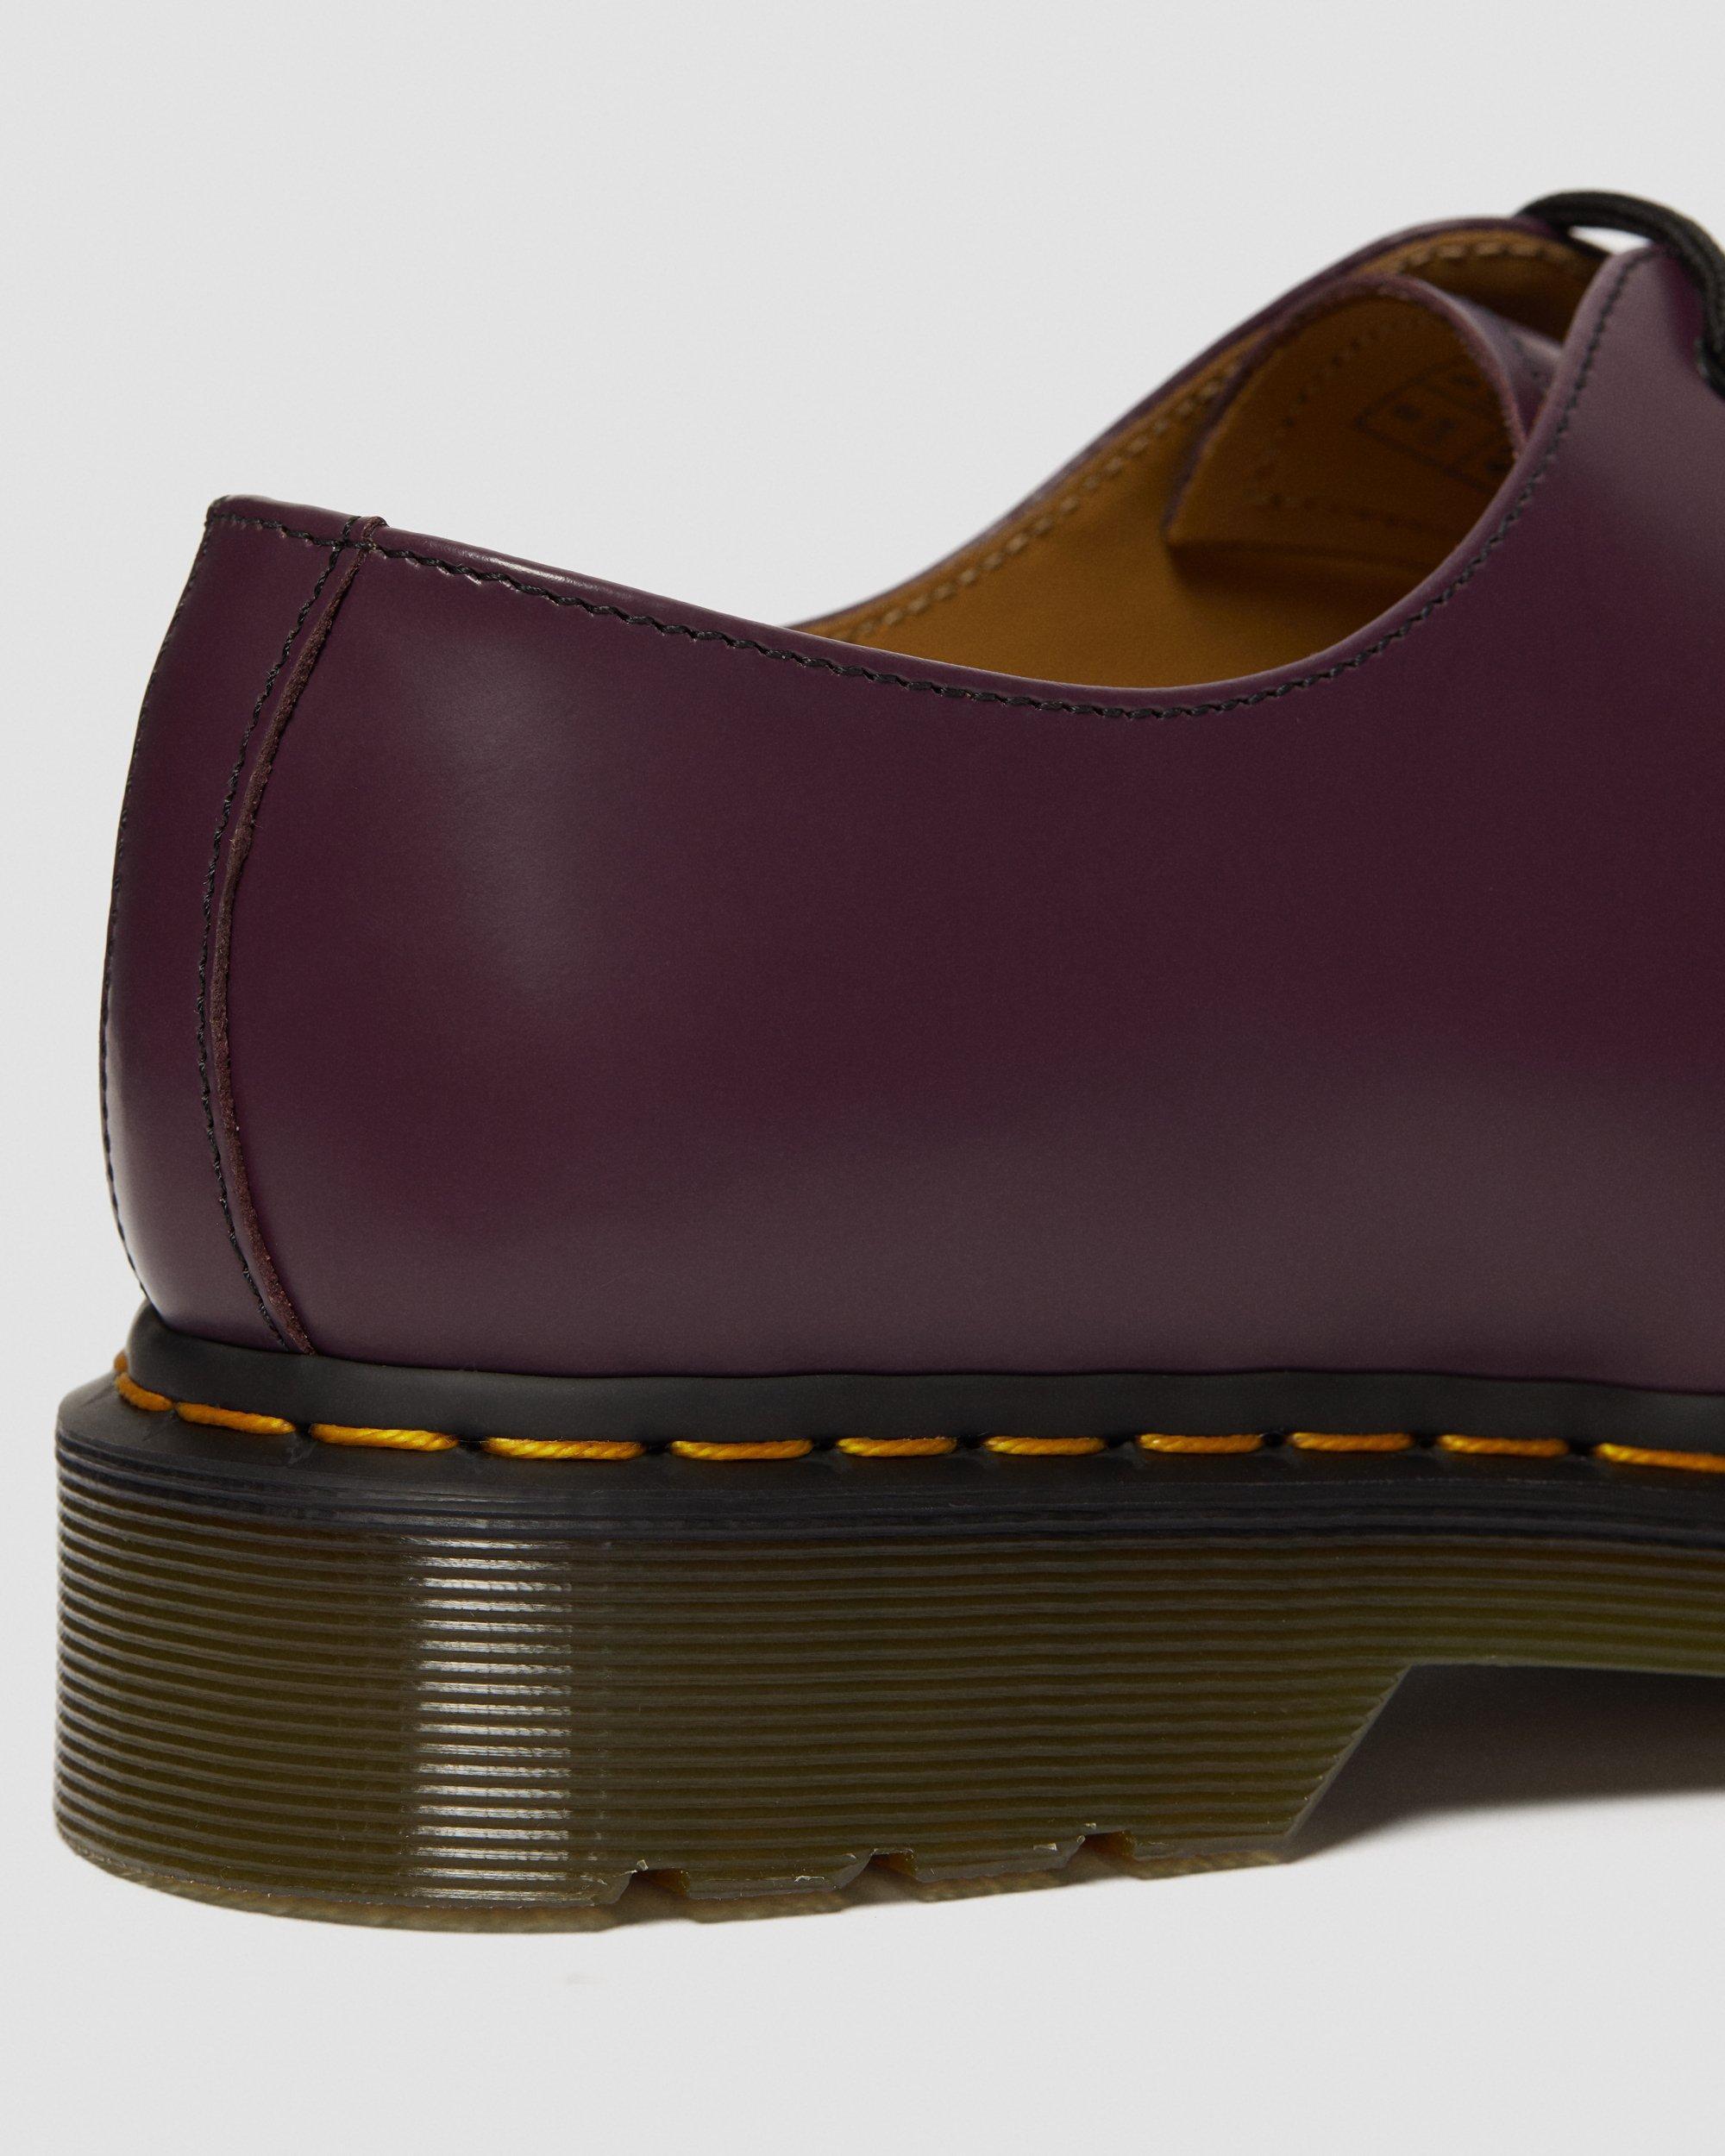 doc martin ladies shoes